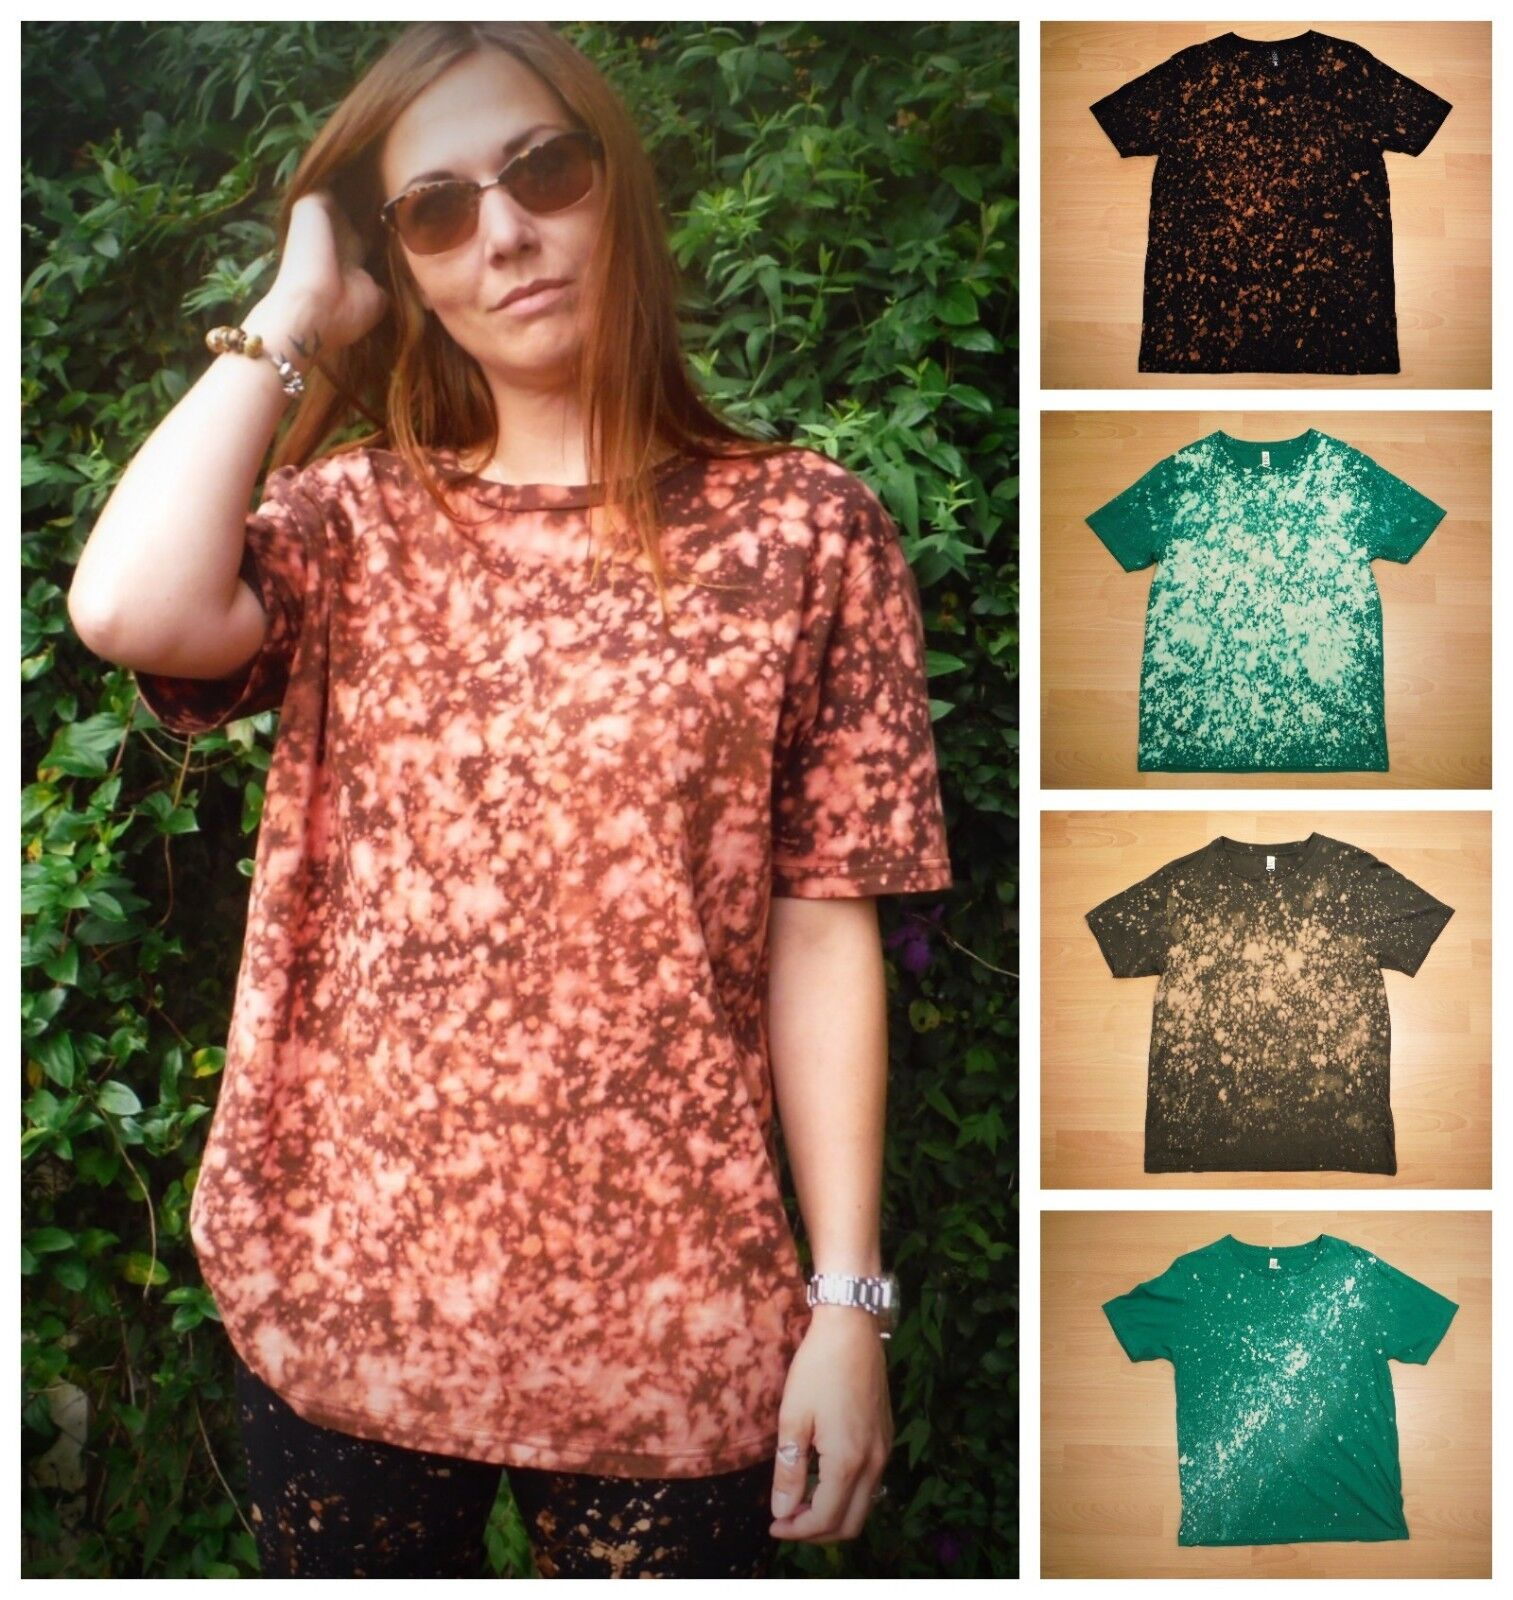 d05e5a42 Ethical Galaxy Splash Unisex T-Shirt Organic Cotton Hand Bleach Dyed Bare  Canvas